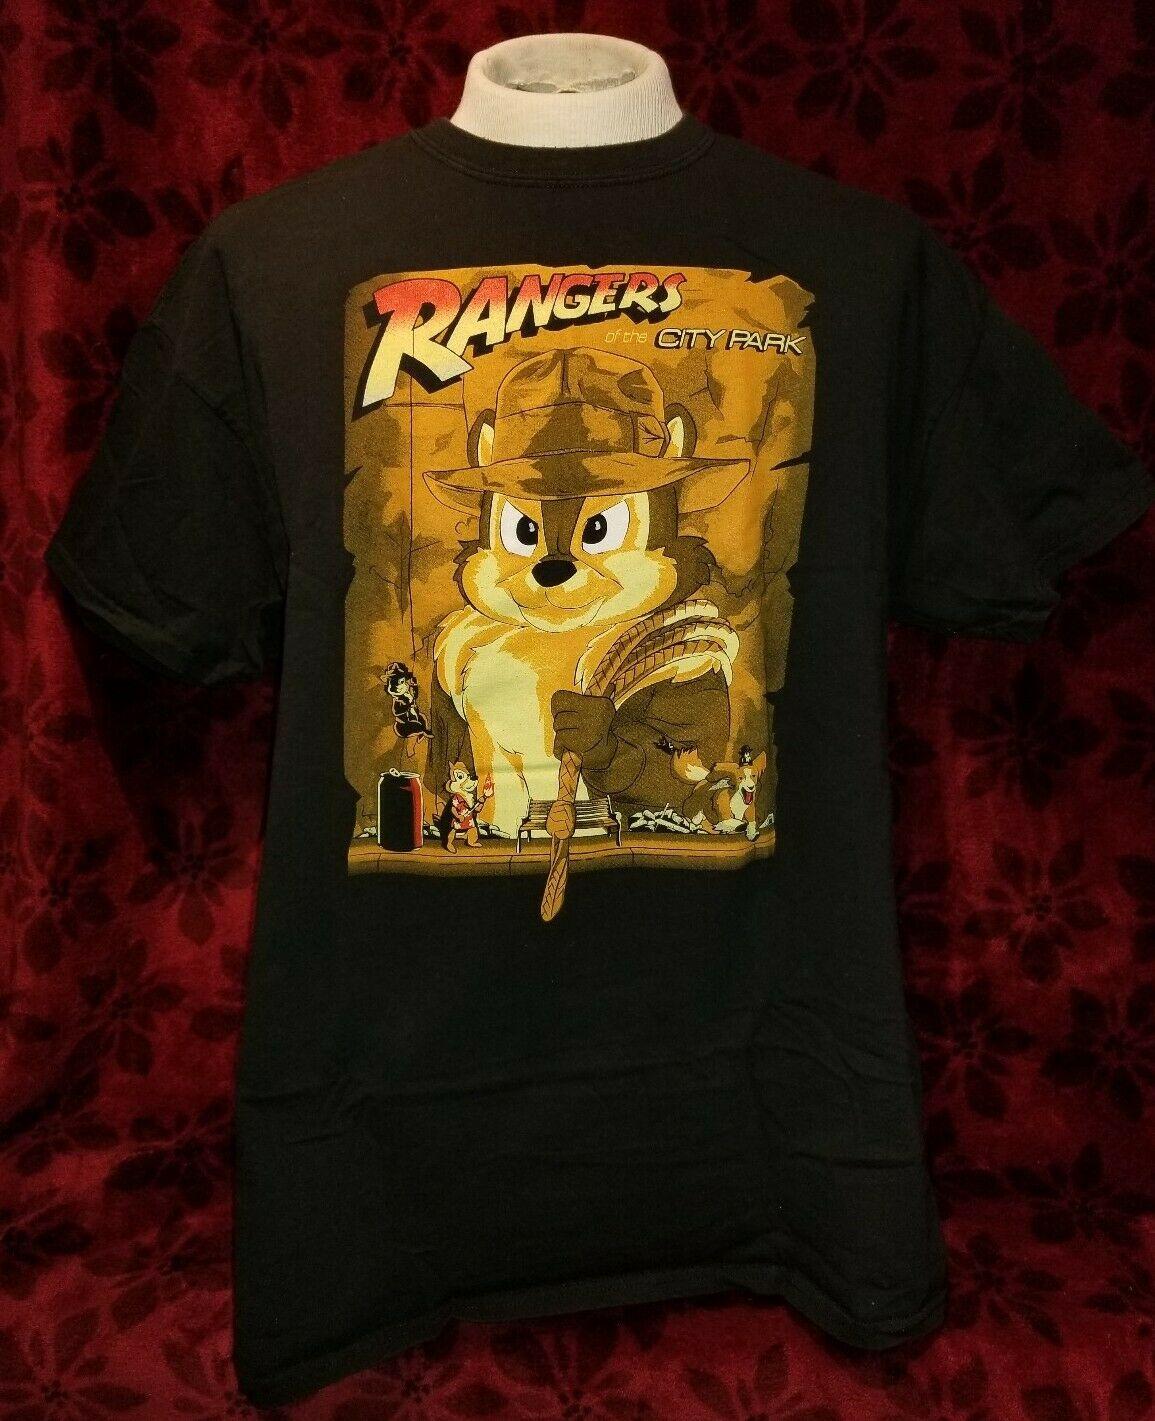 Camiseta de los Rangers del parque Xl, Chip N Dale Rescue Rangers Indiana Jones, parodia